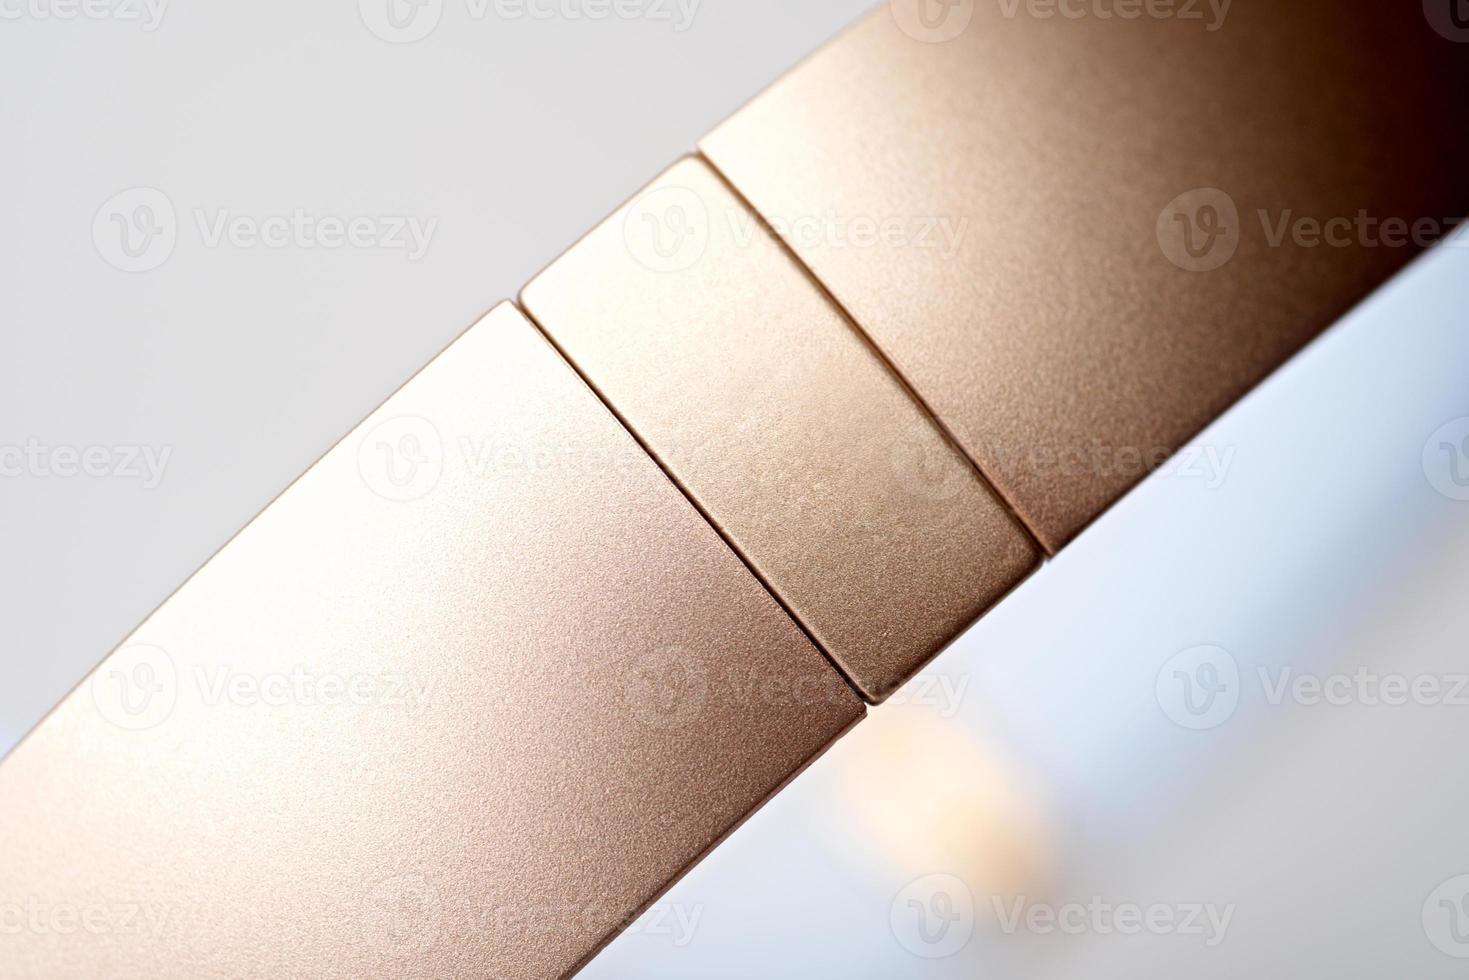 hoofdtelefoon ontwerp detail foto